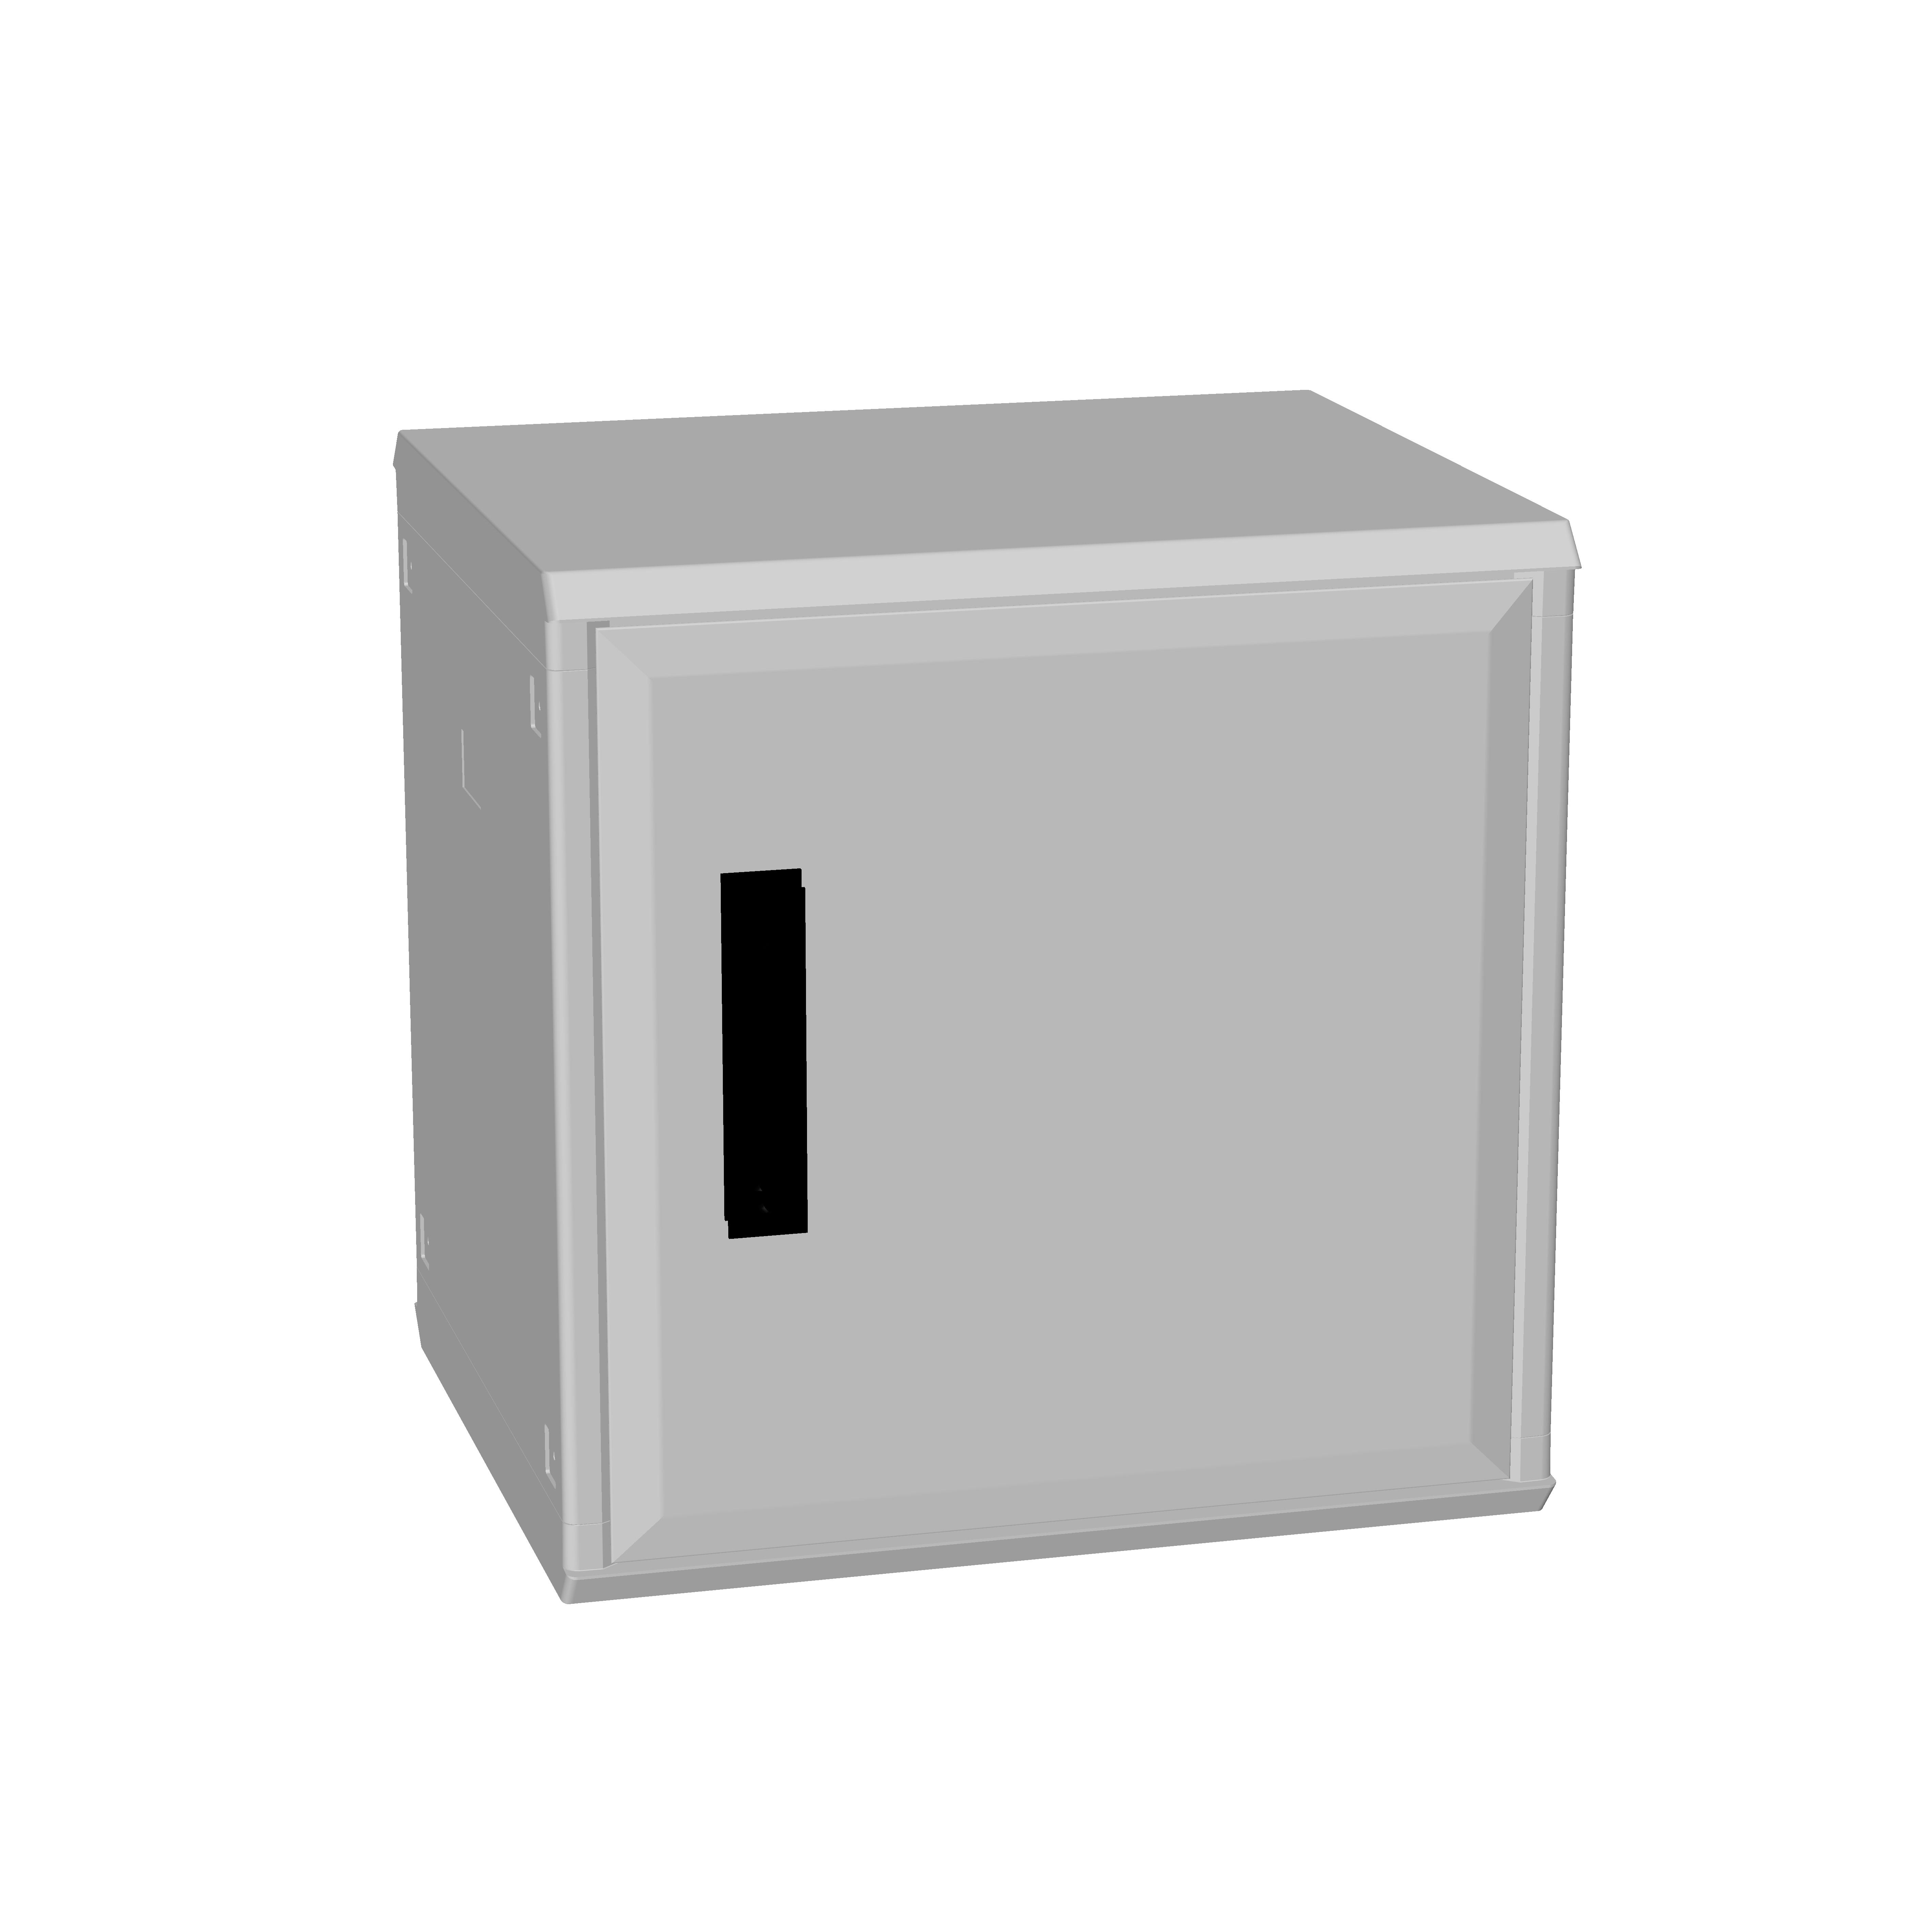 1 Stk Polyesterschrank, eintürig, 500x500x432 POCC2240--